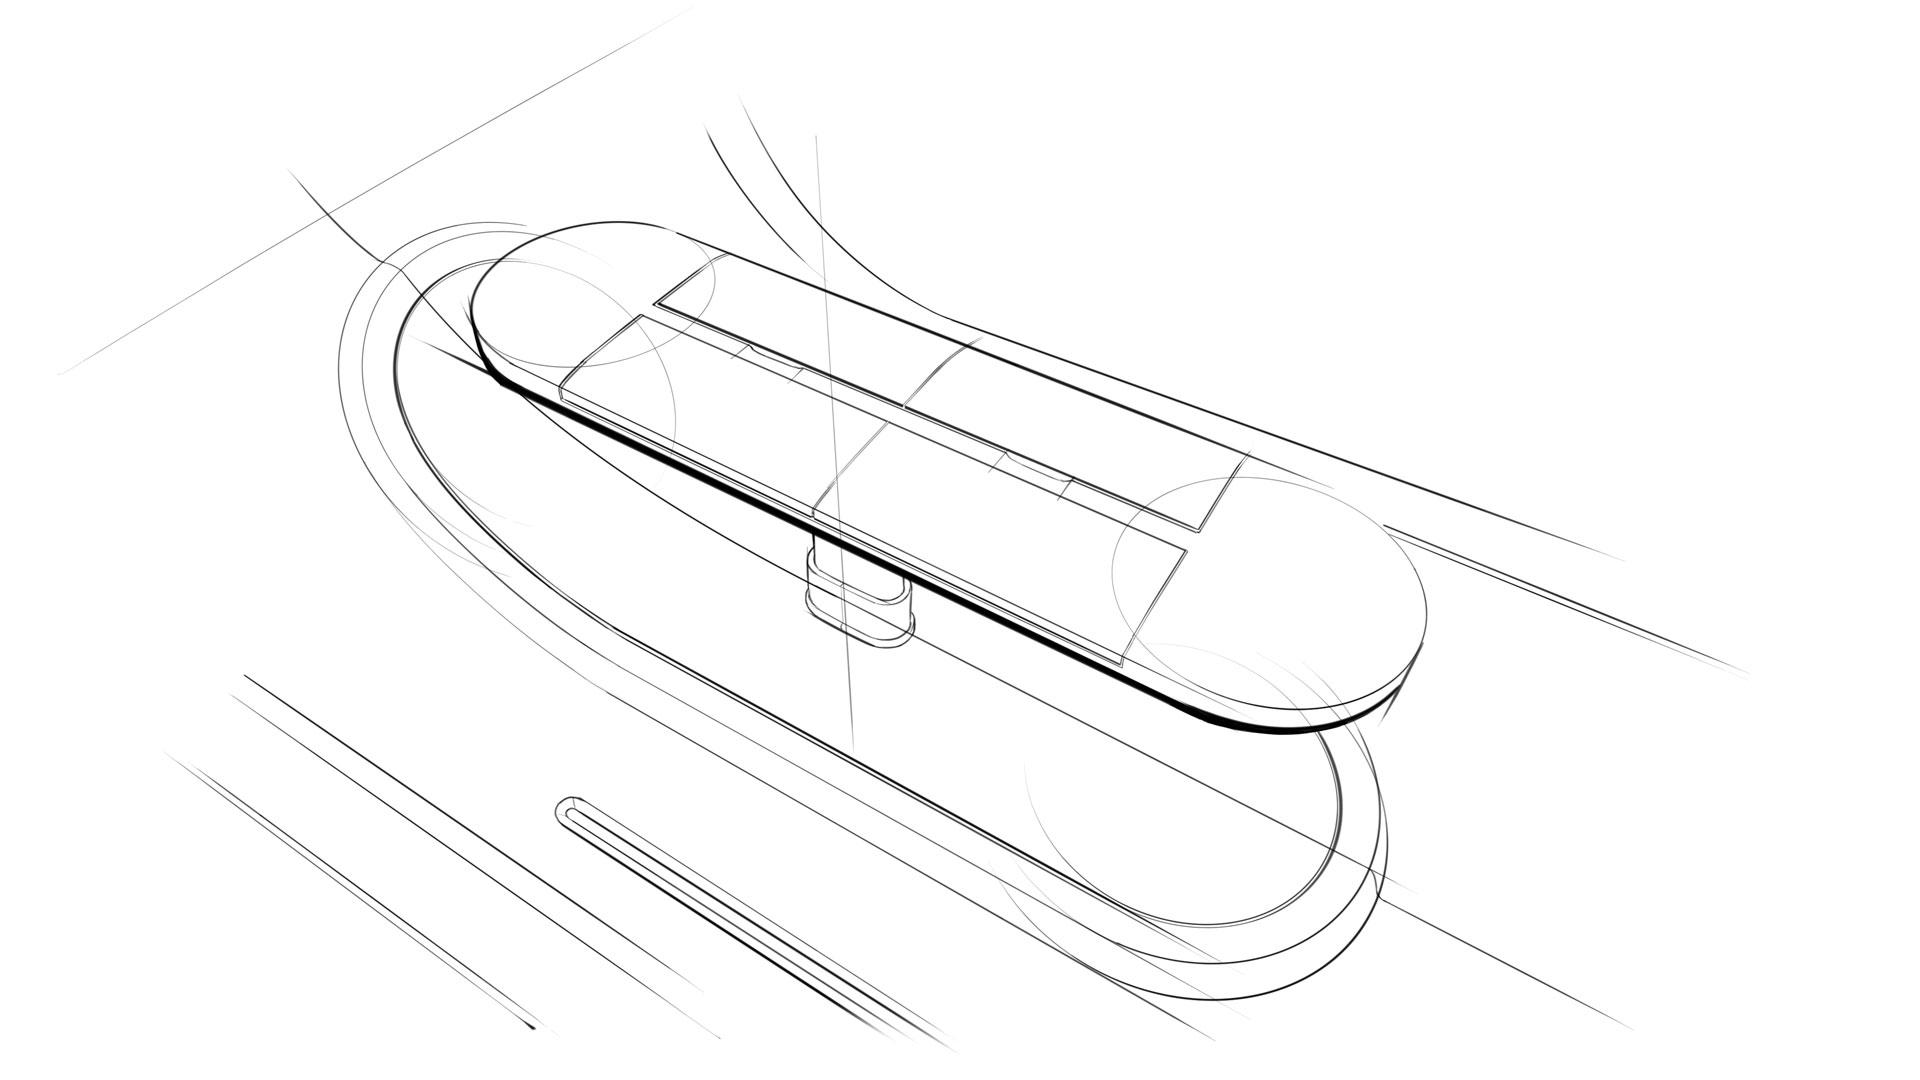 Sketch_Interior_05.jpg